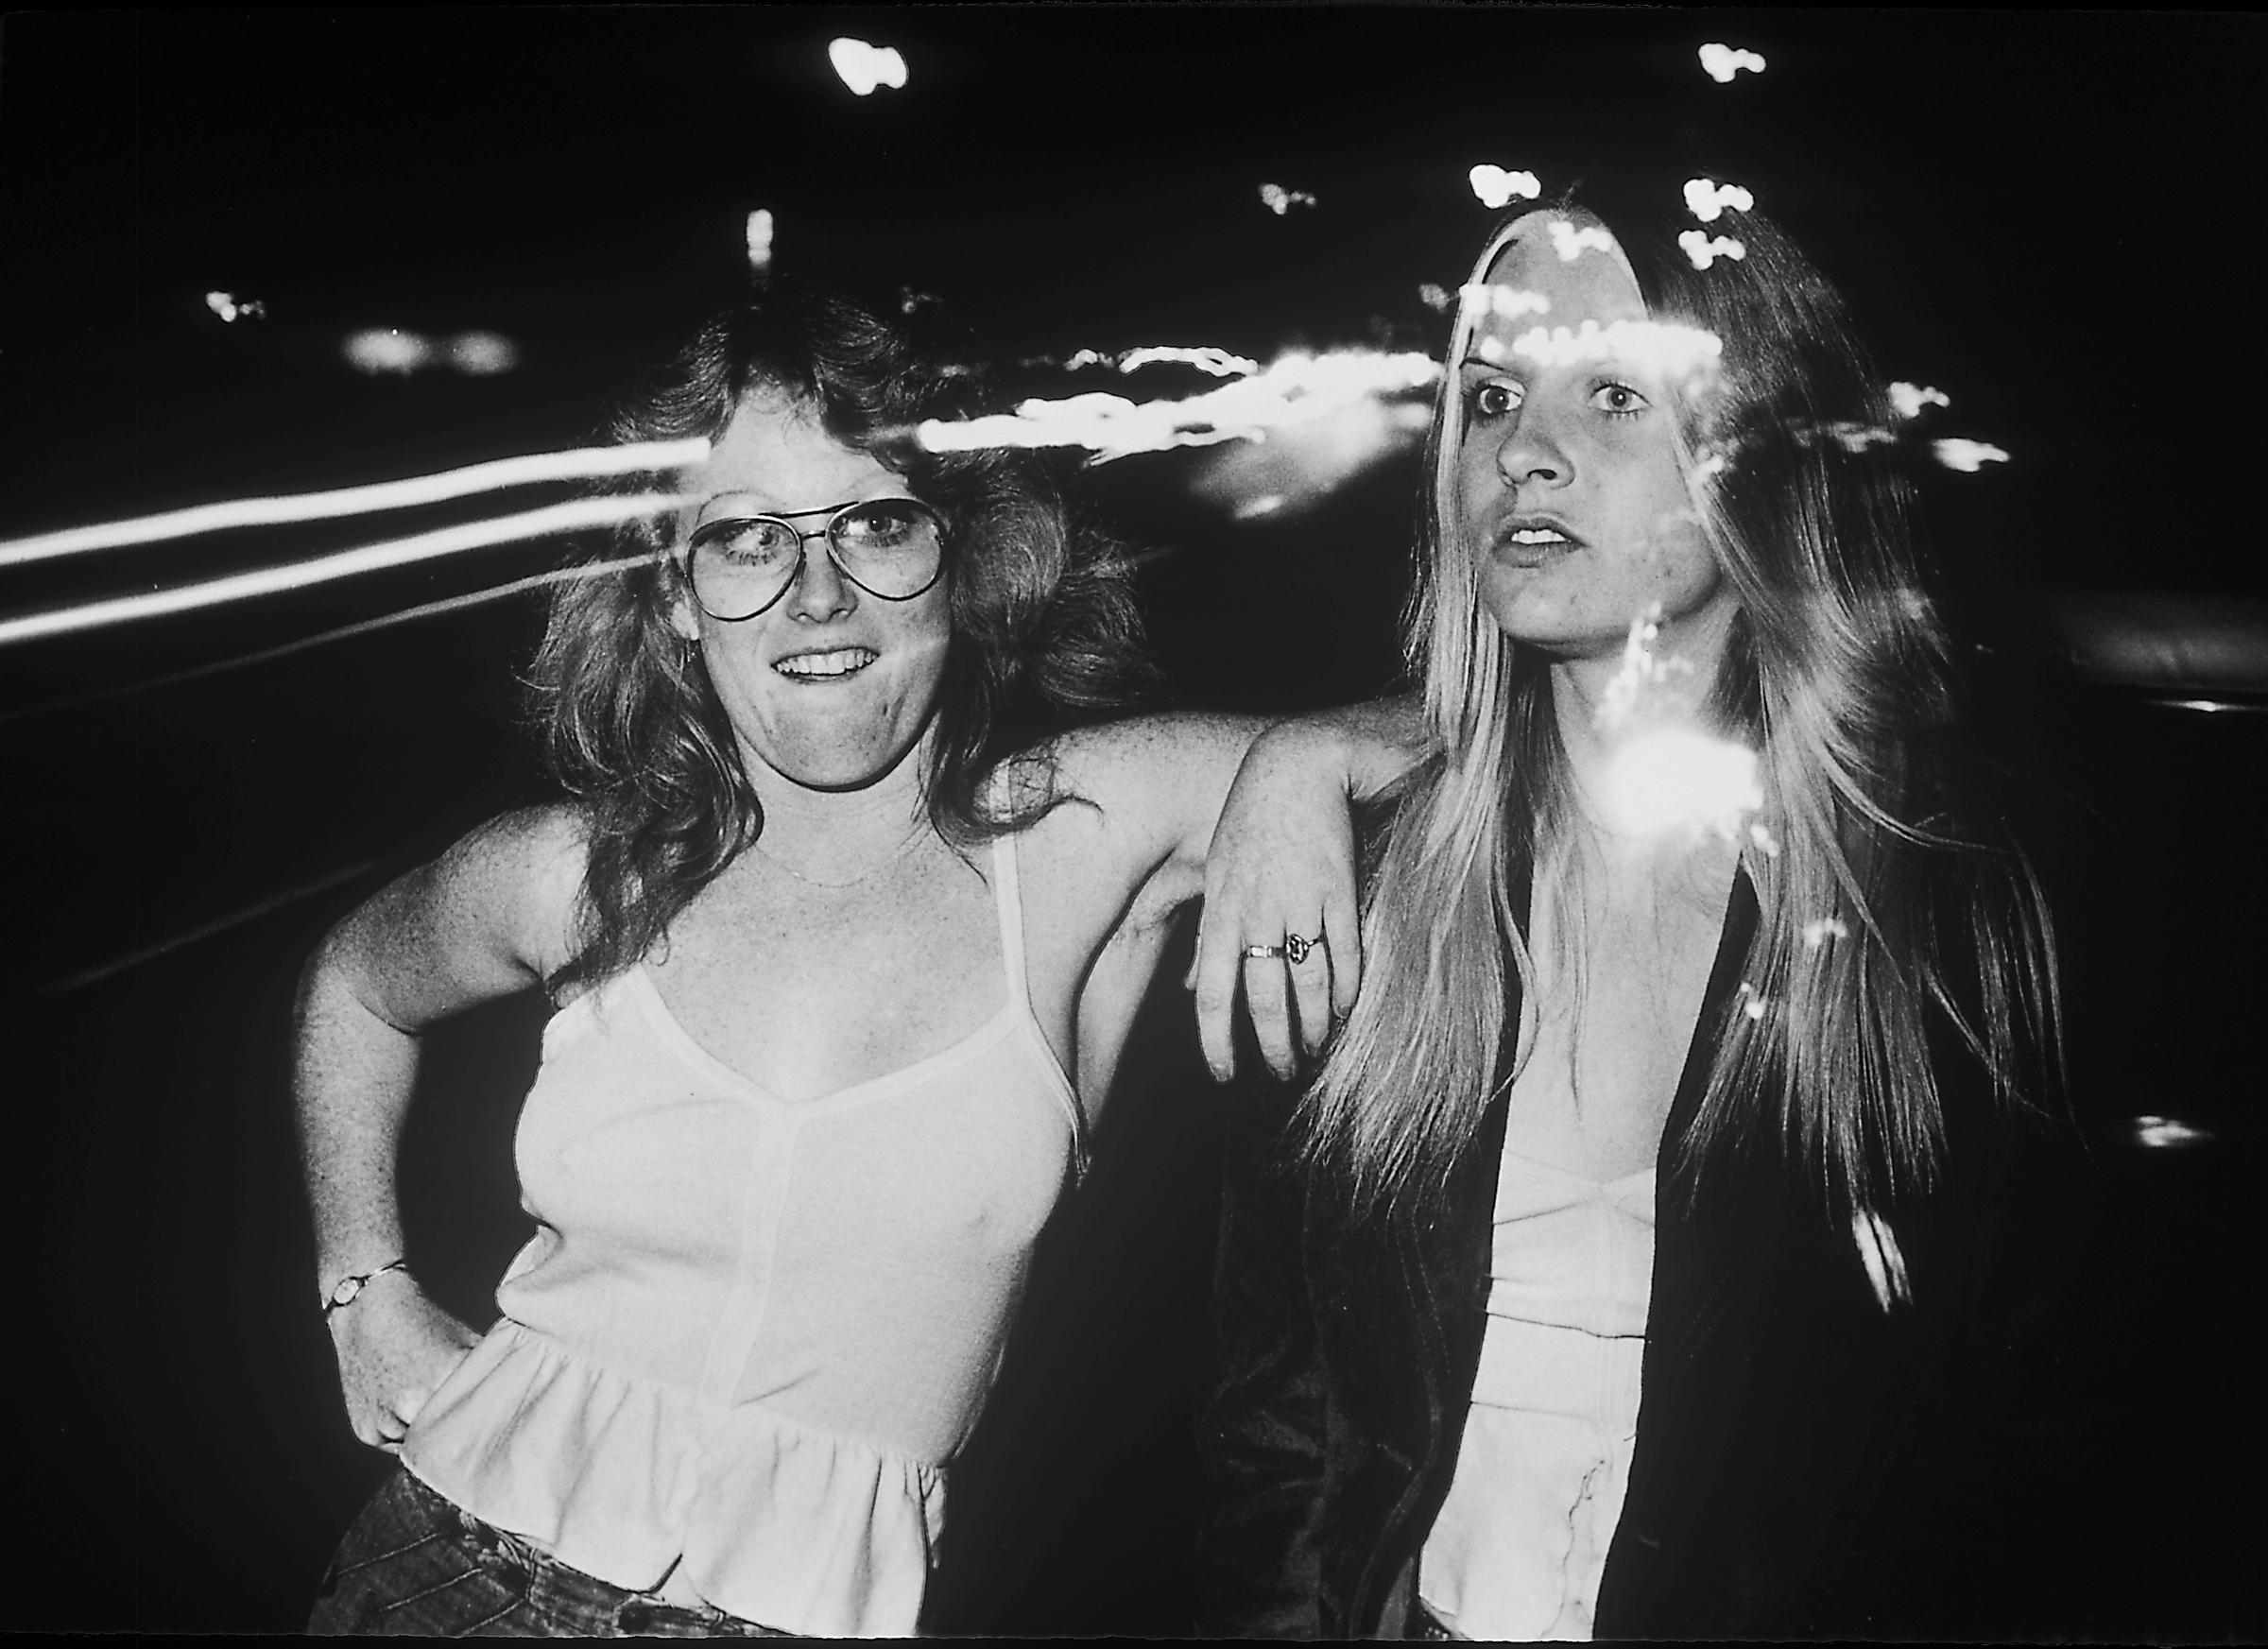 Stoned girls